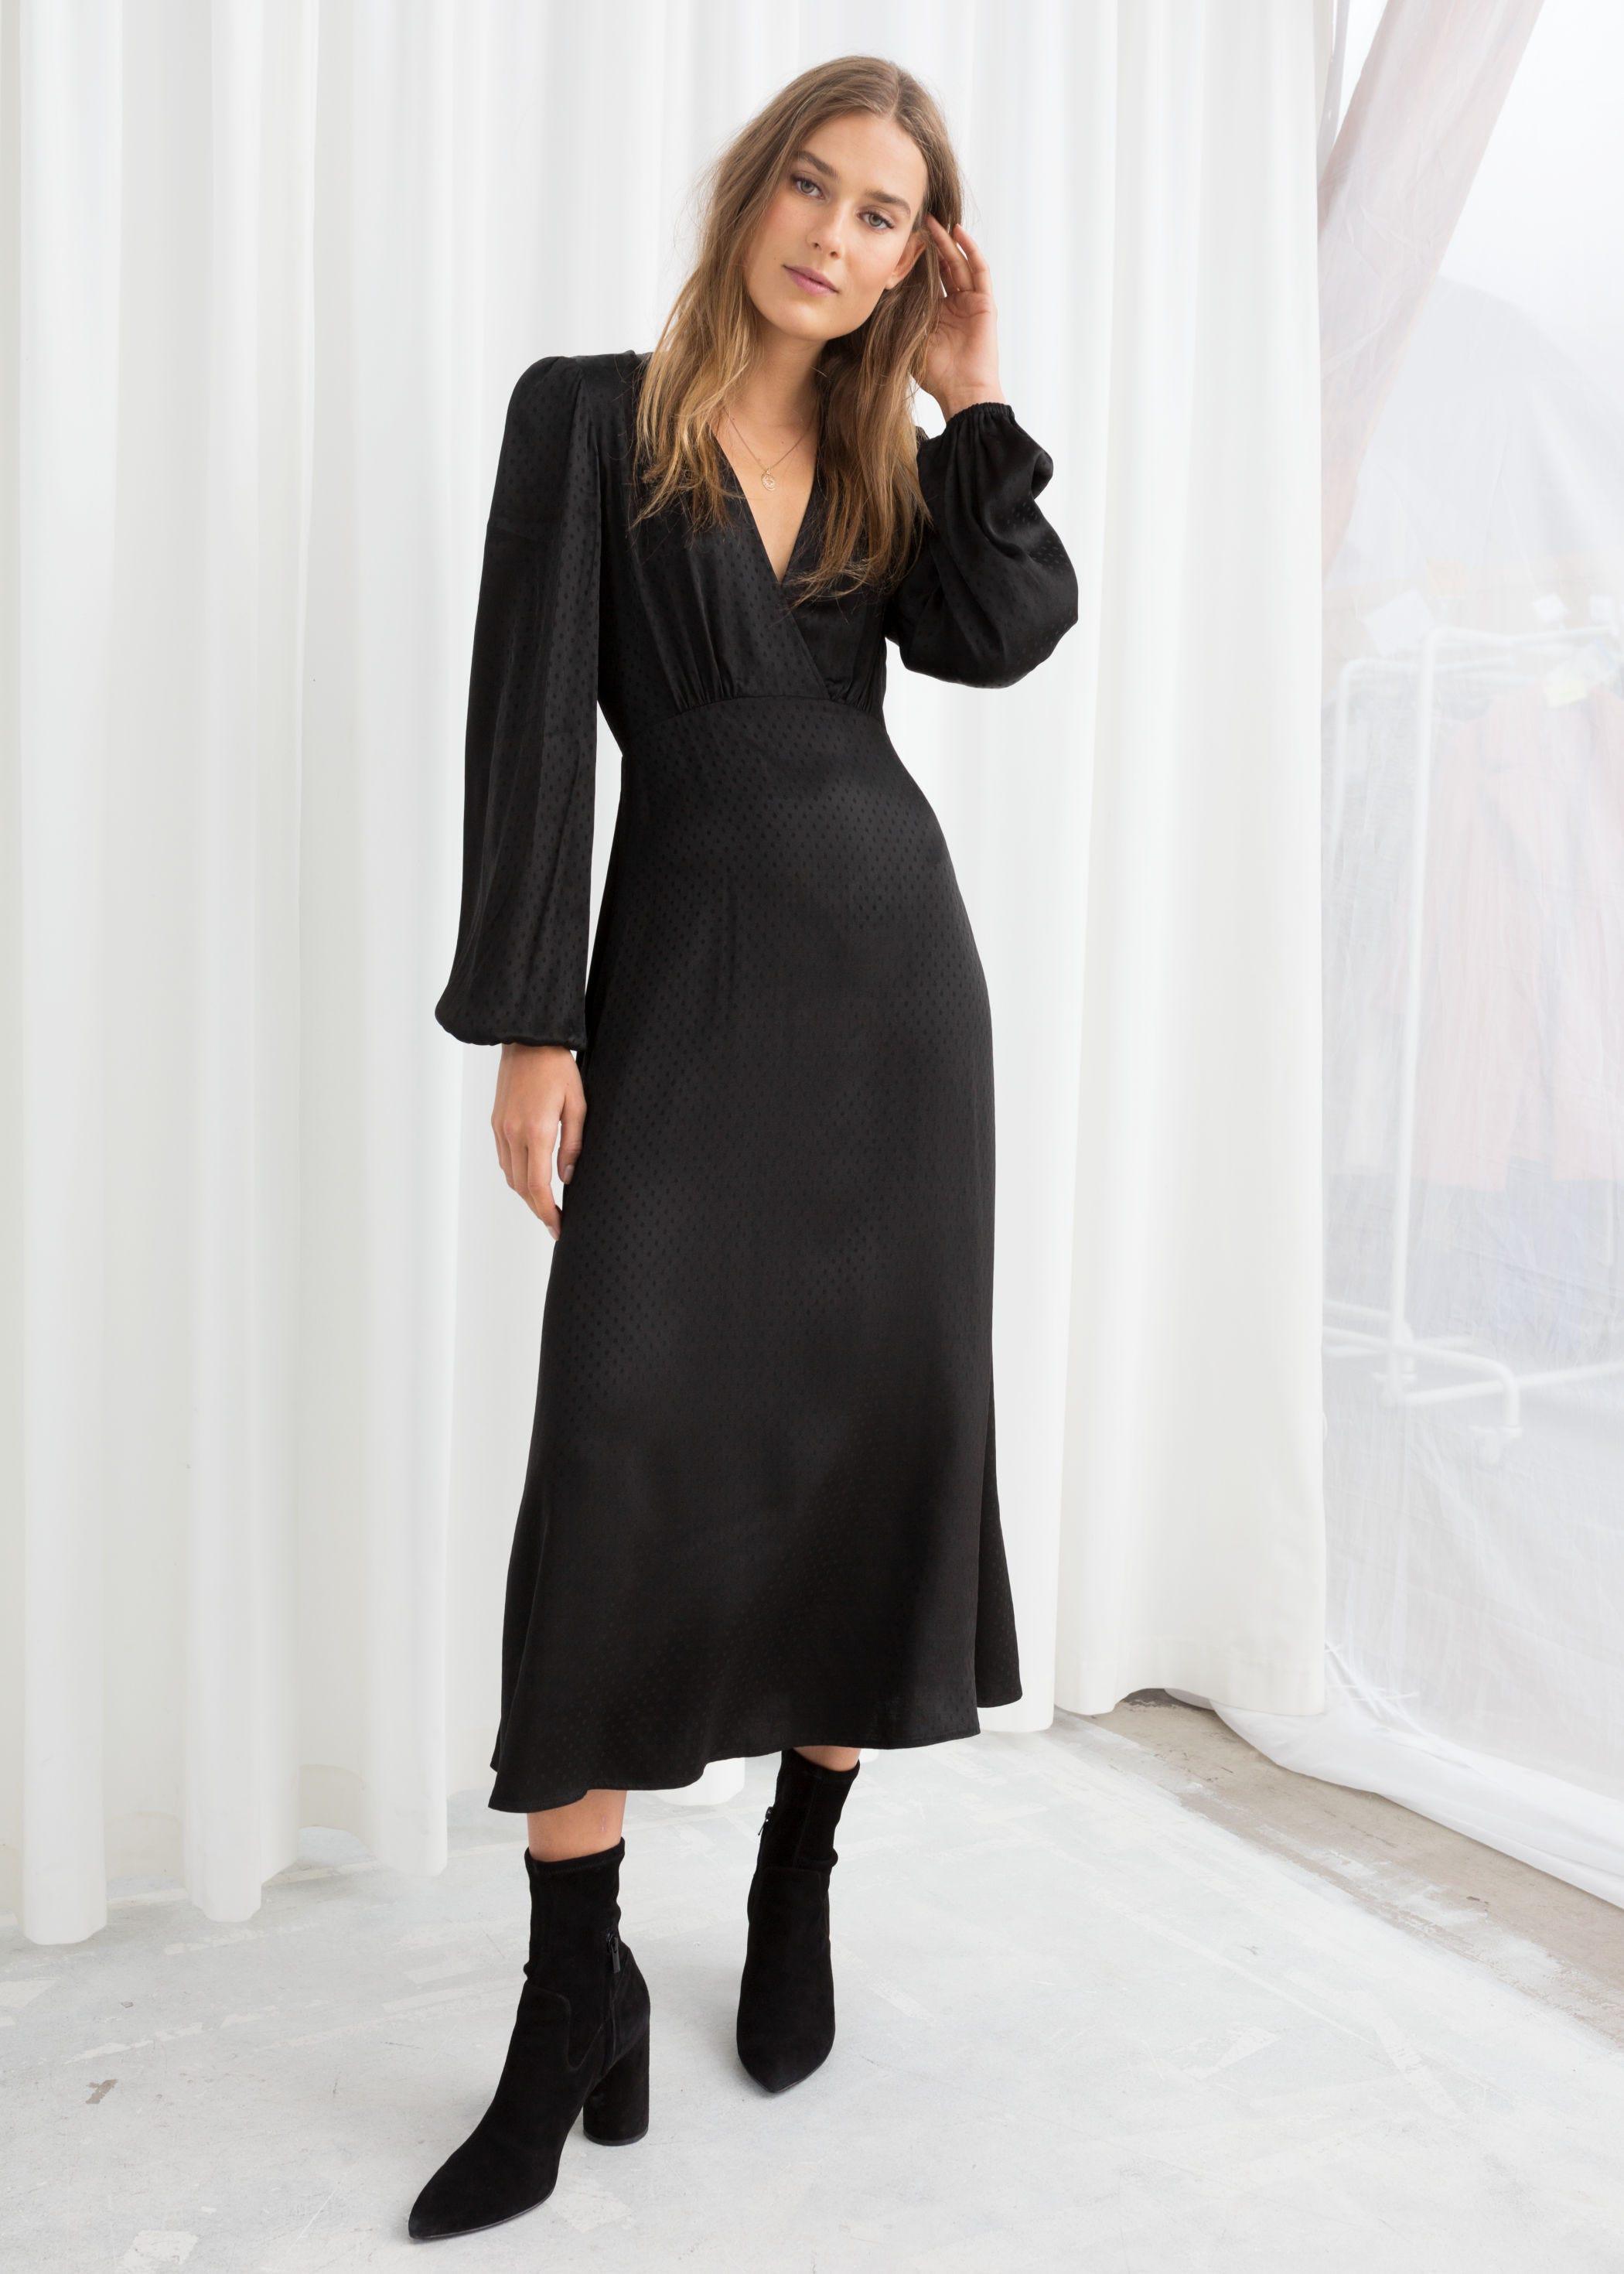 9020907be2 Other Stories. Jacquard Empire Midi Dress